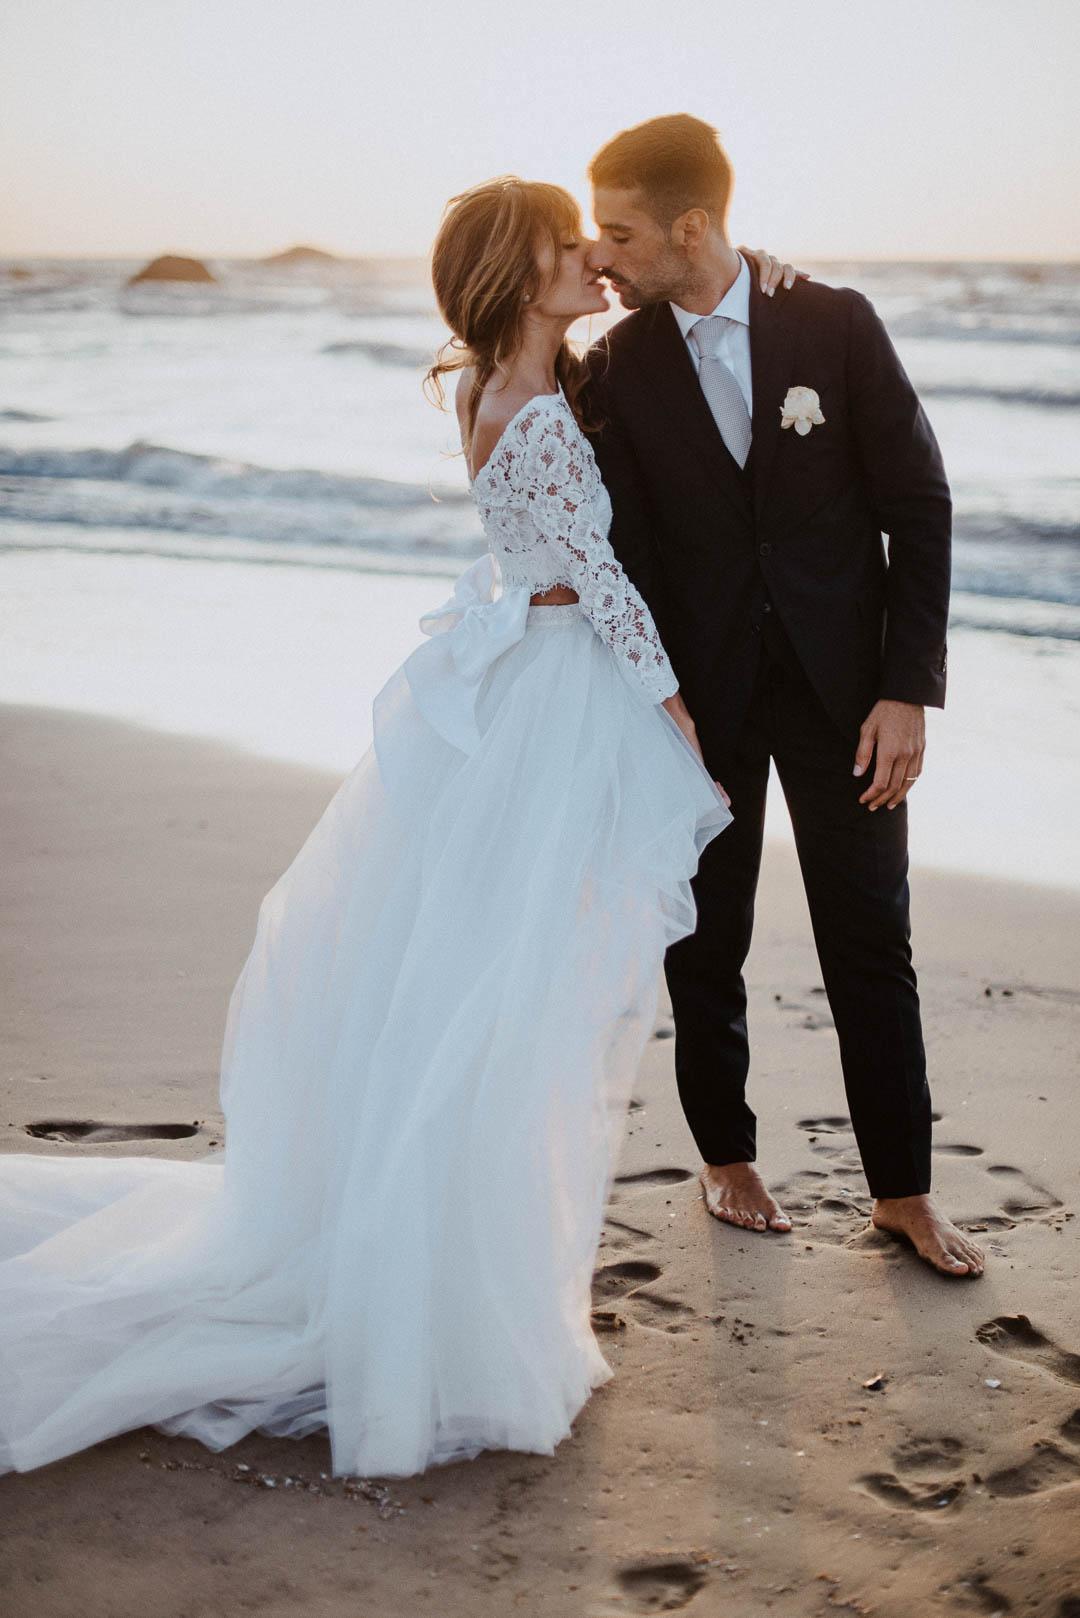 wedding-photographer-destination-fineart-bespoke-reportage-napoli-nabilah-vivianeizzo-spazio46-123